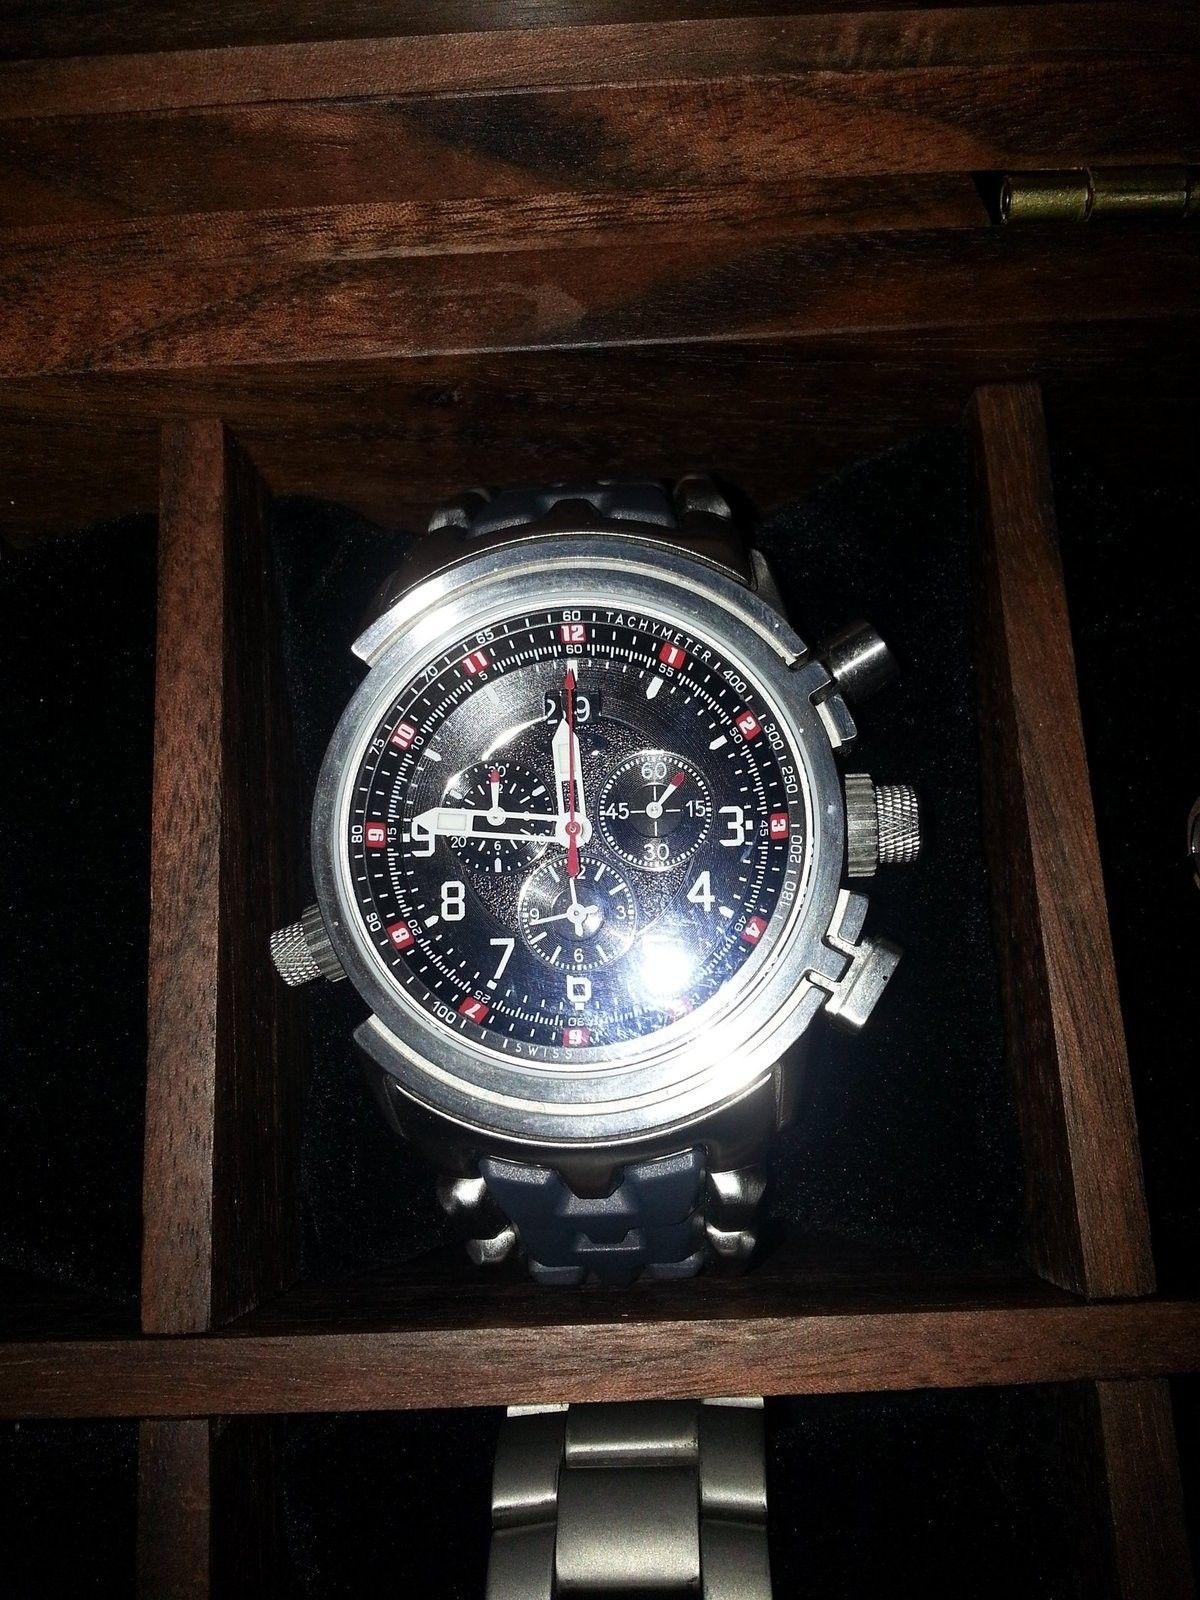 Got a new watch box.....collection growing - 20151201_220226.jpg